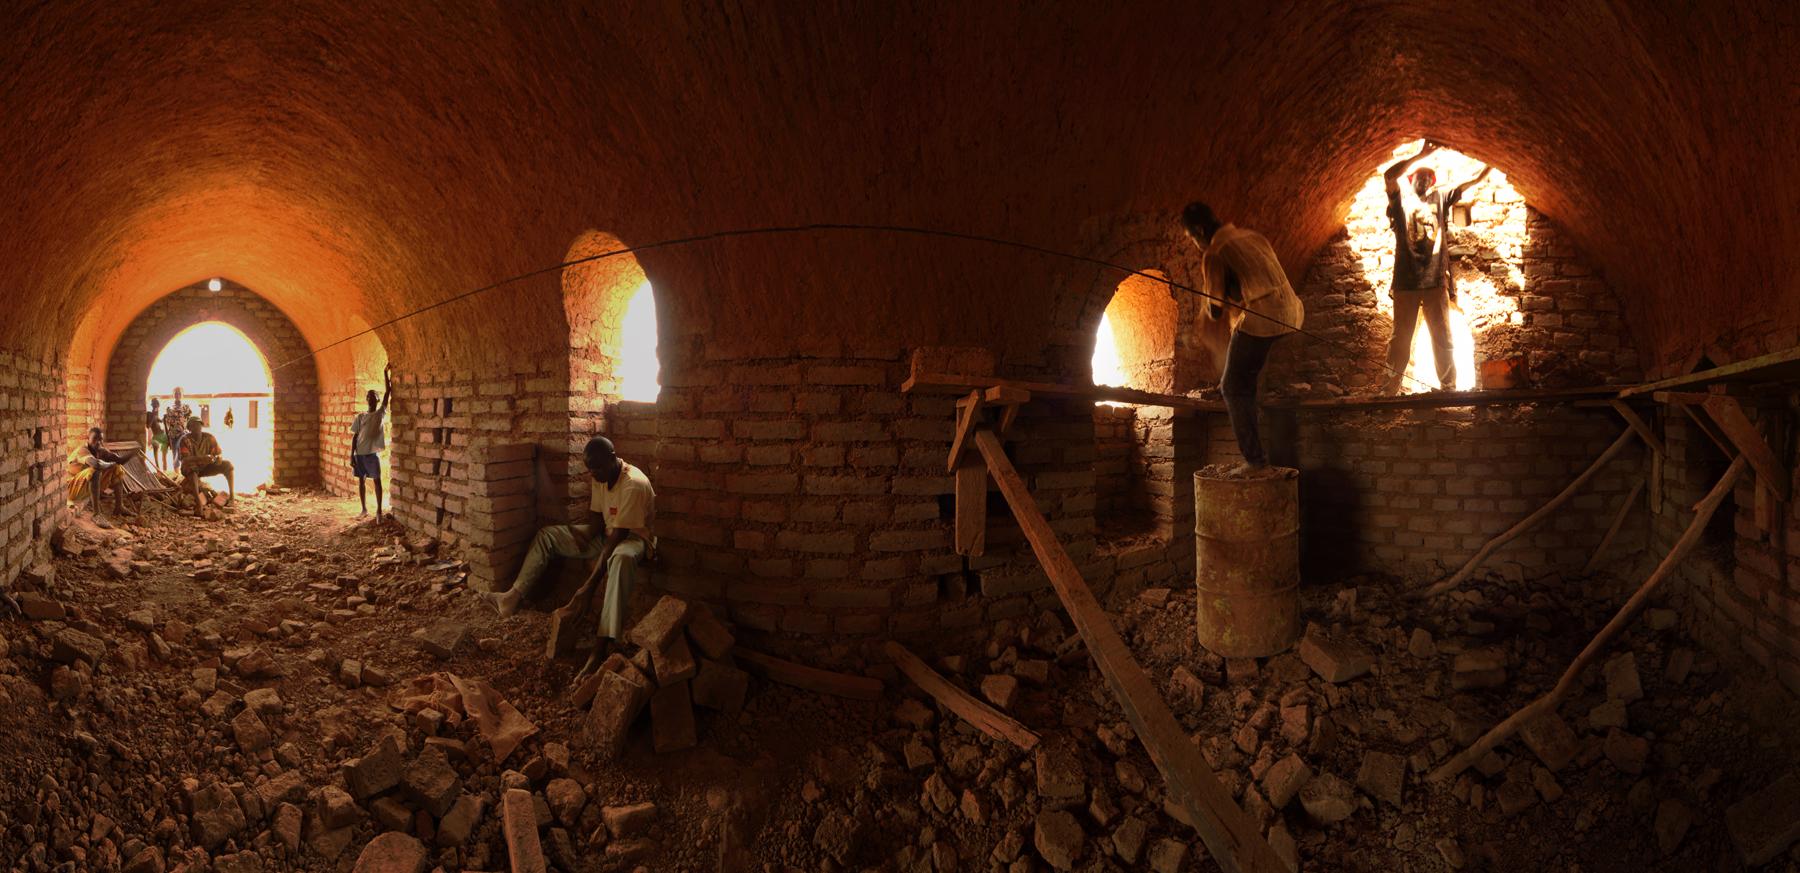 Inside_a_Nubial_Vault_-_Earth_Roofs_in_the_Sahel_Program.jpg